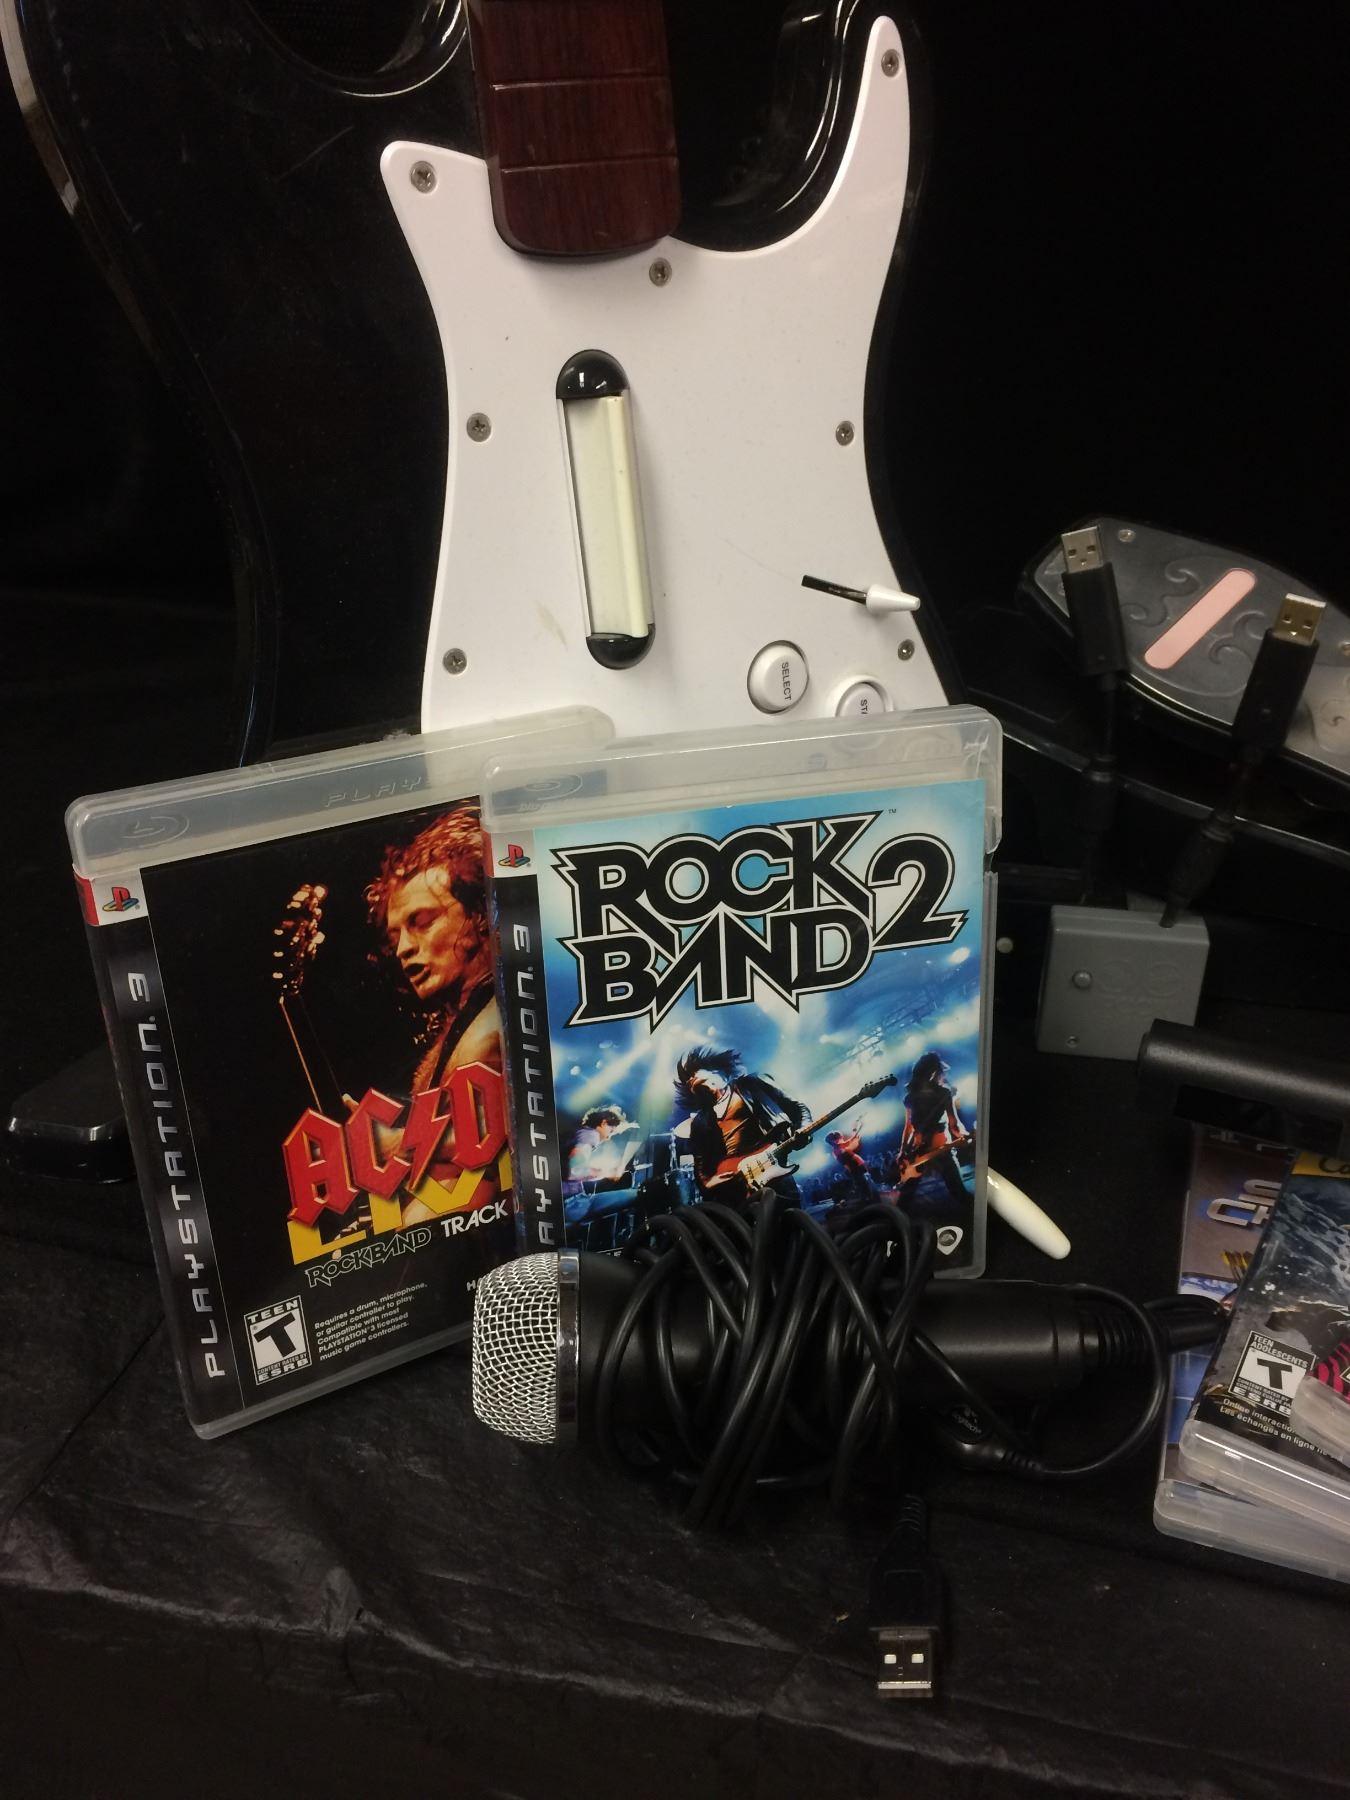 Rock Band 2 Wireless Drum Set, Guitar, Game Xbox 360 Bundle Lot